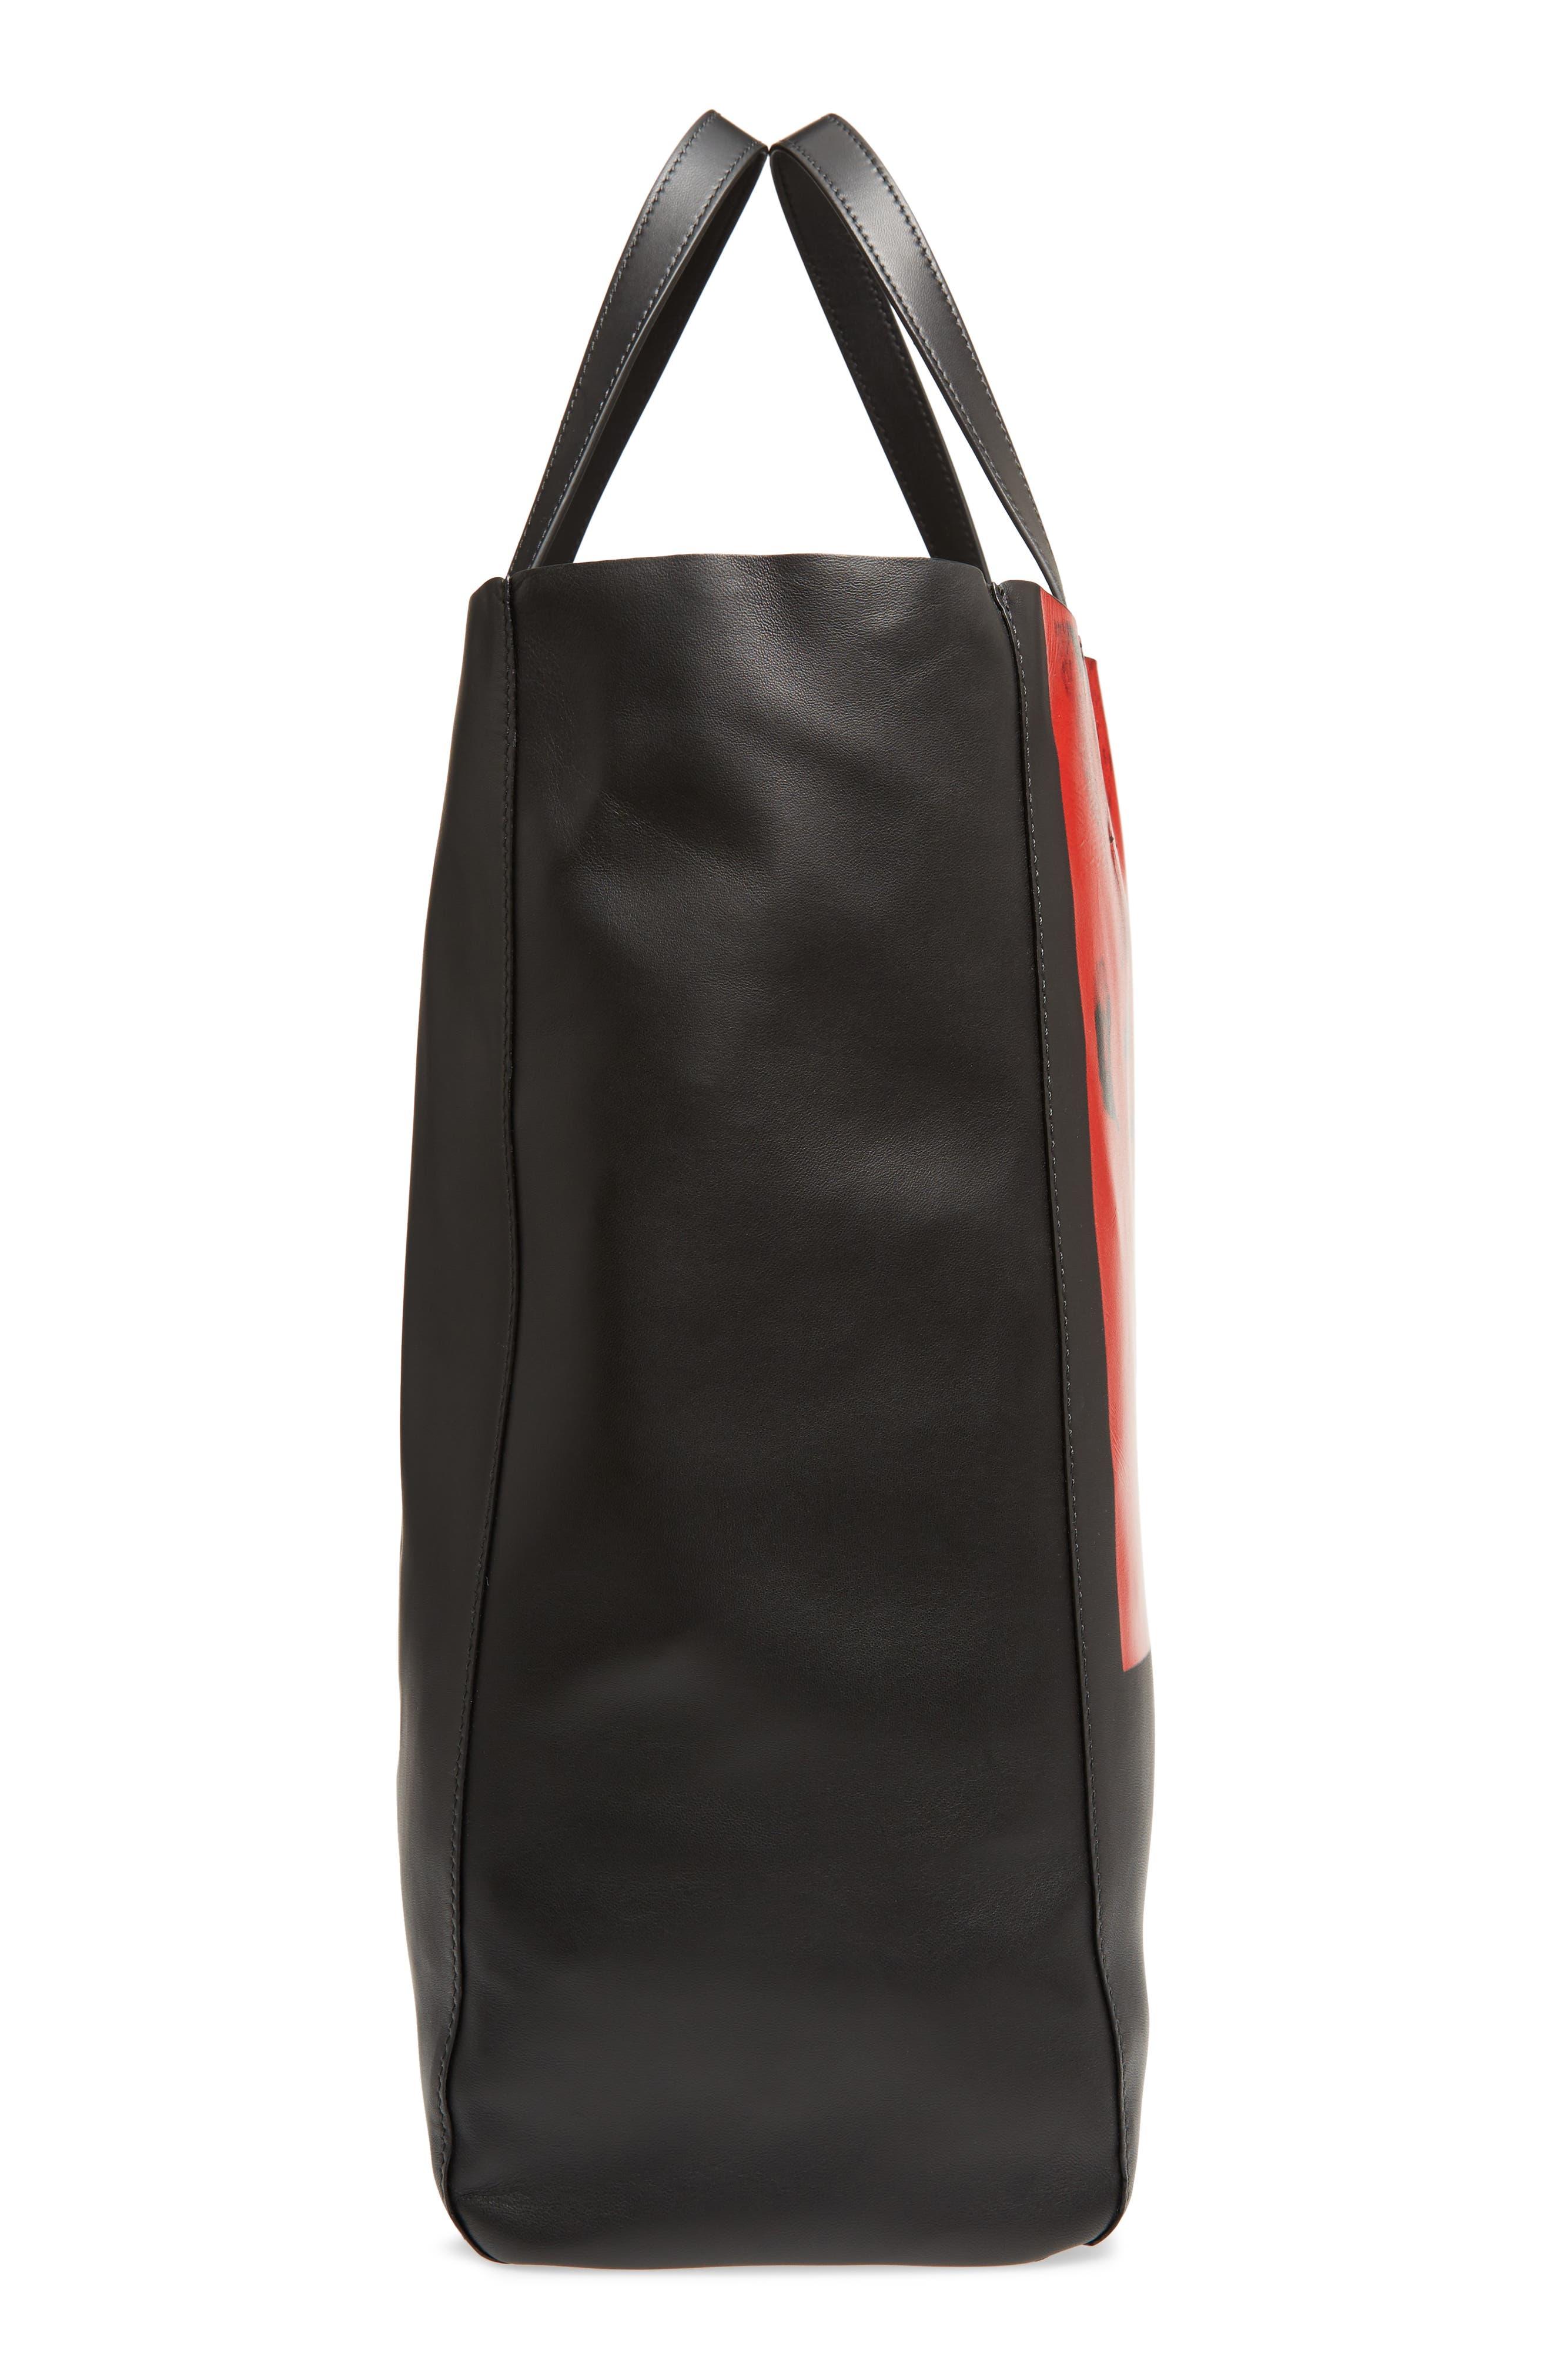 x Andy Warhol Foundation Dennis Hopper Calfskin Leather Bucket Bag,                             Alternate thumbnail 5, color,                             Black/ Red